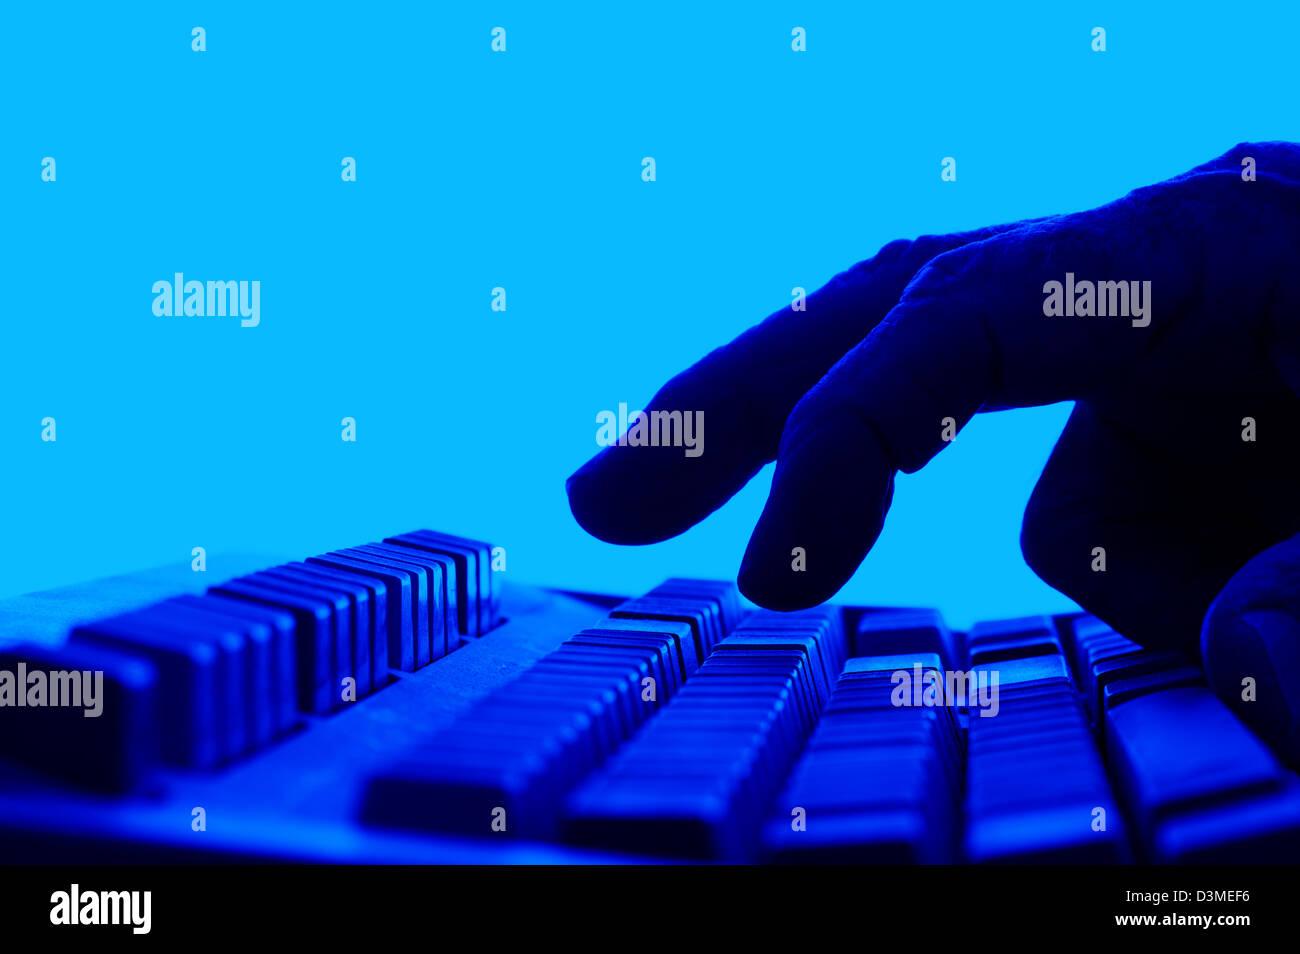 closeup fingers on keyboard blue - Stock Image